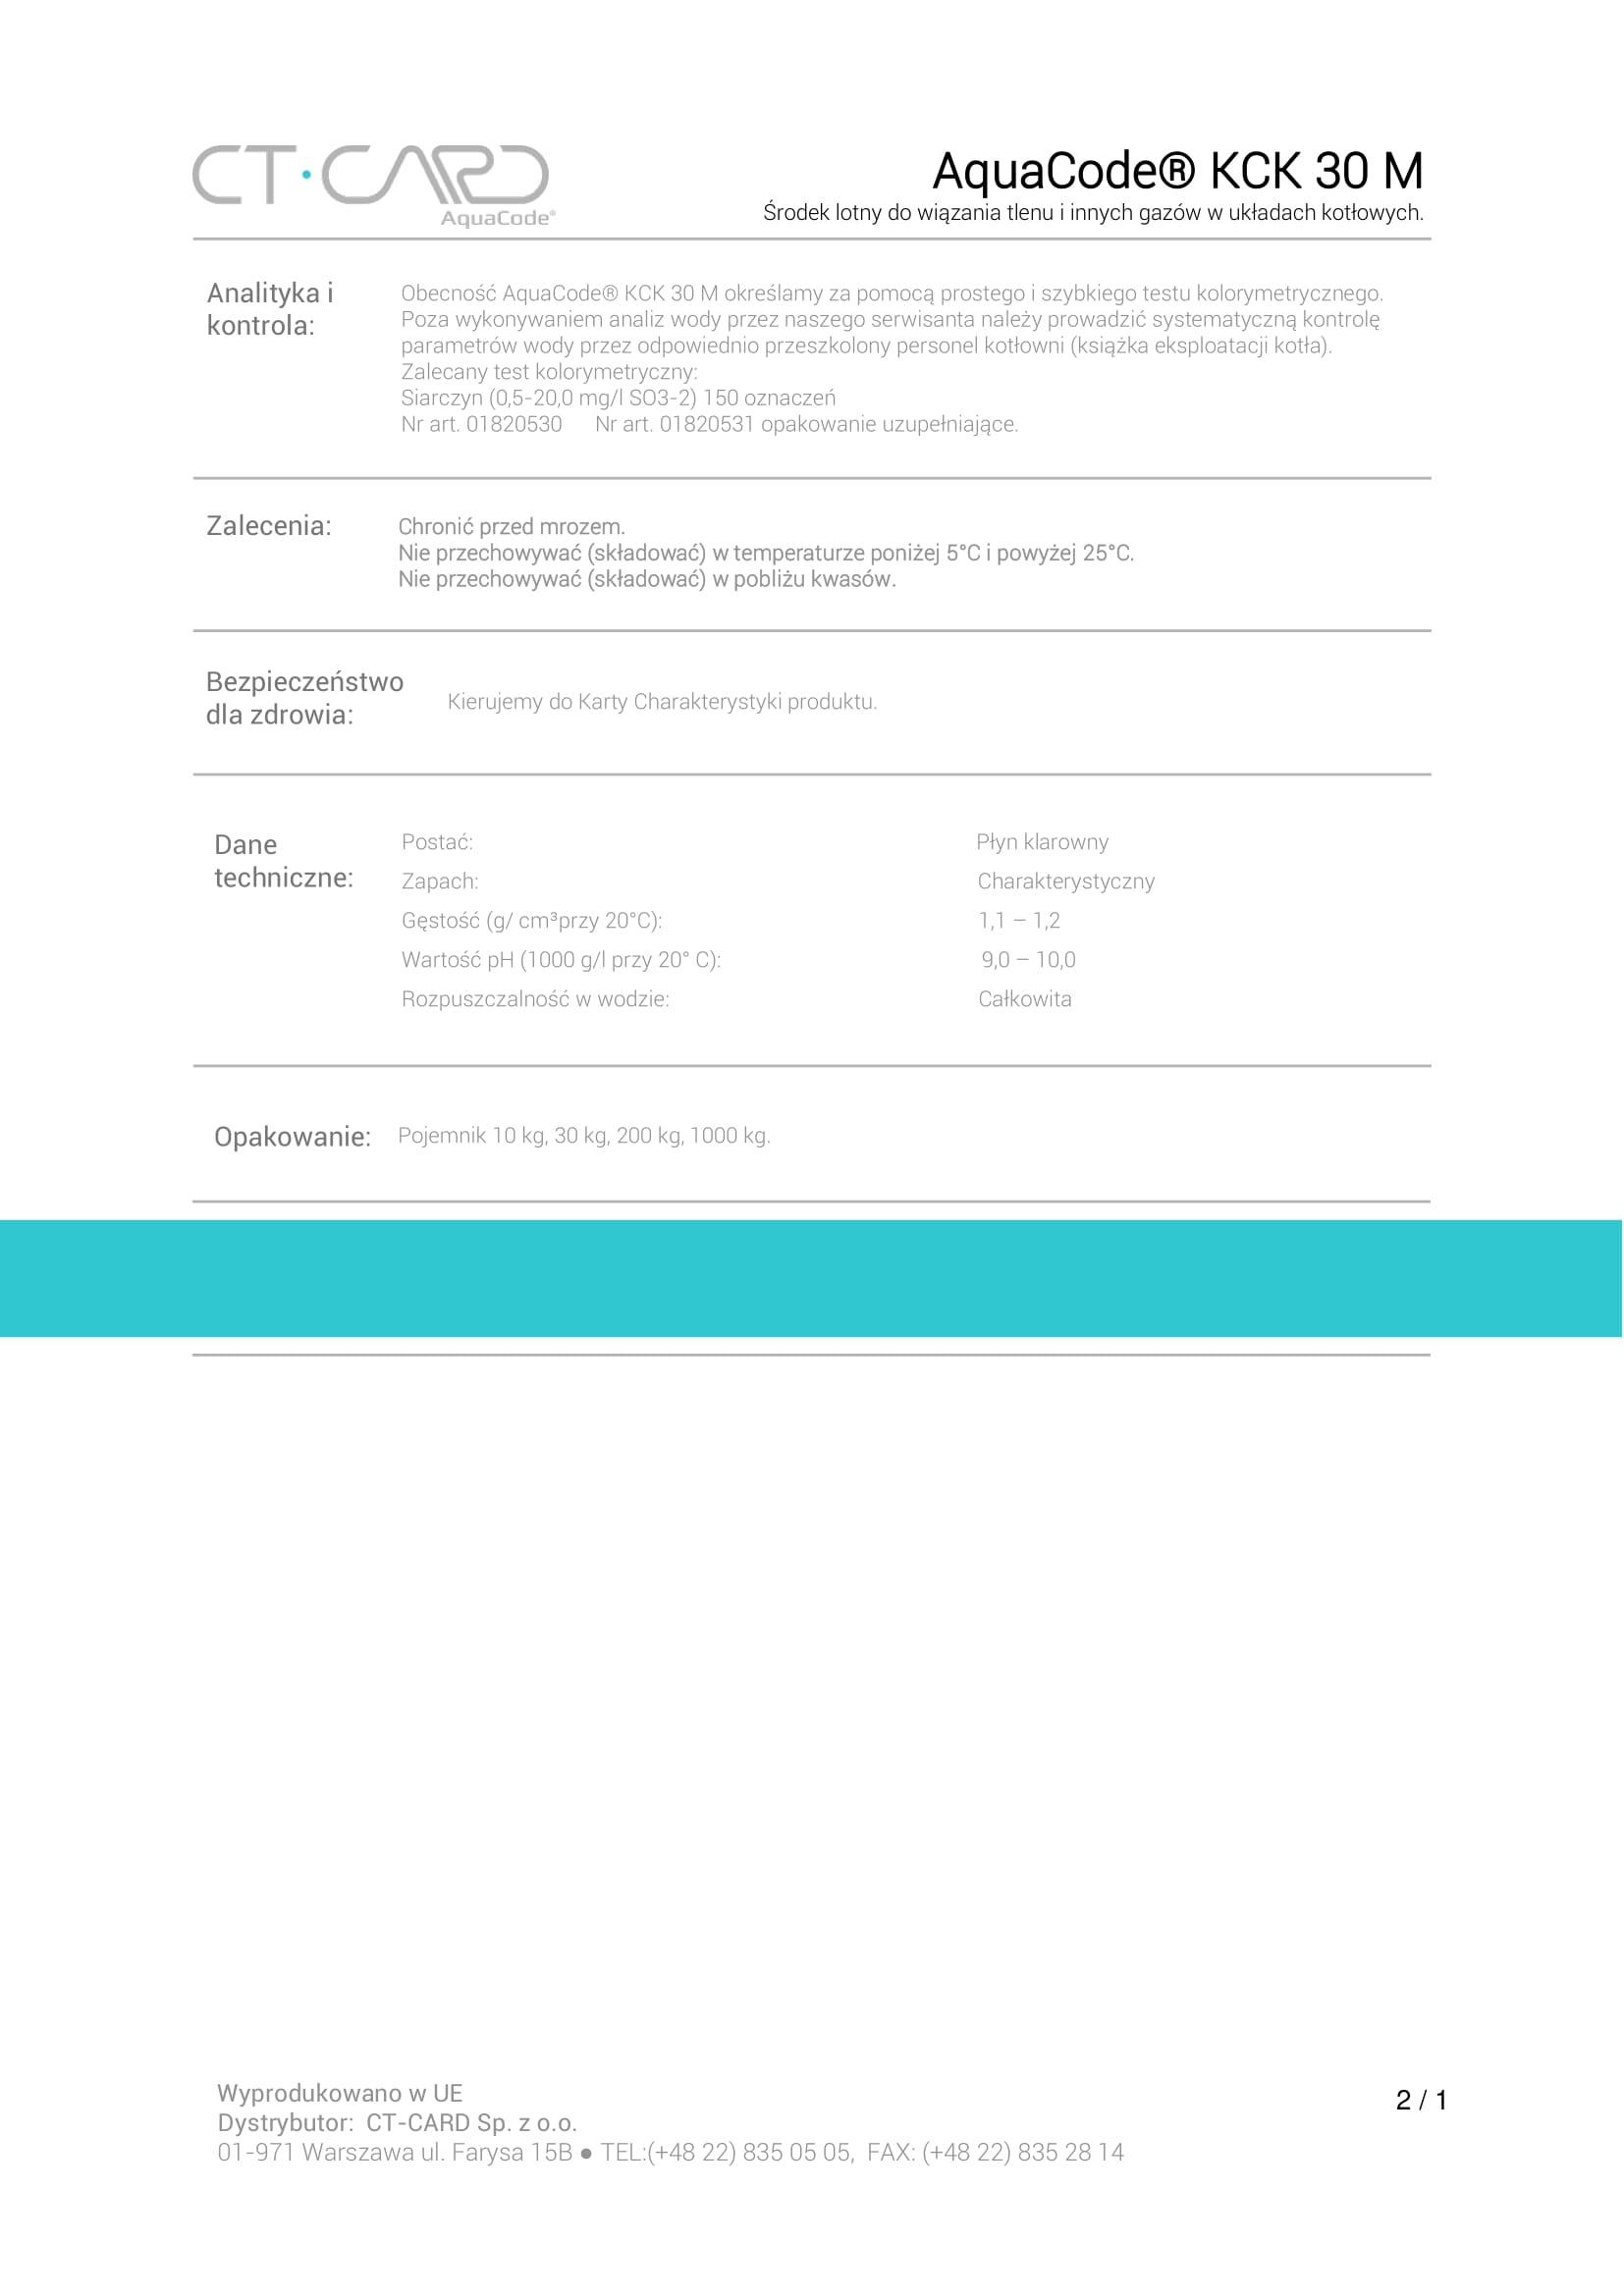 AquaCode_KCK_30_M-2